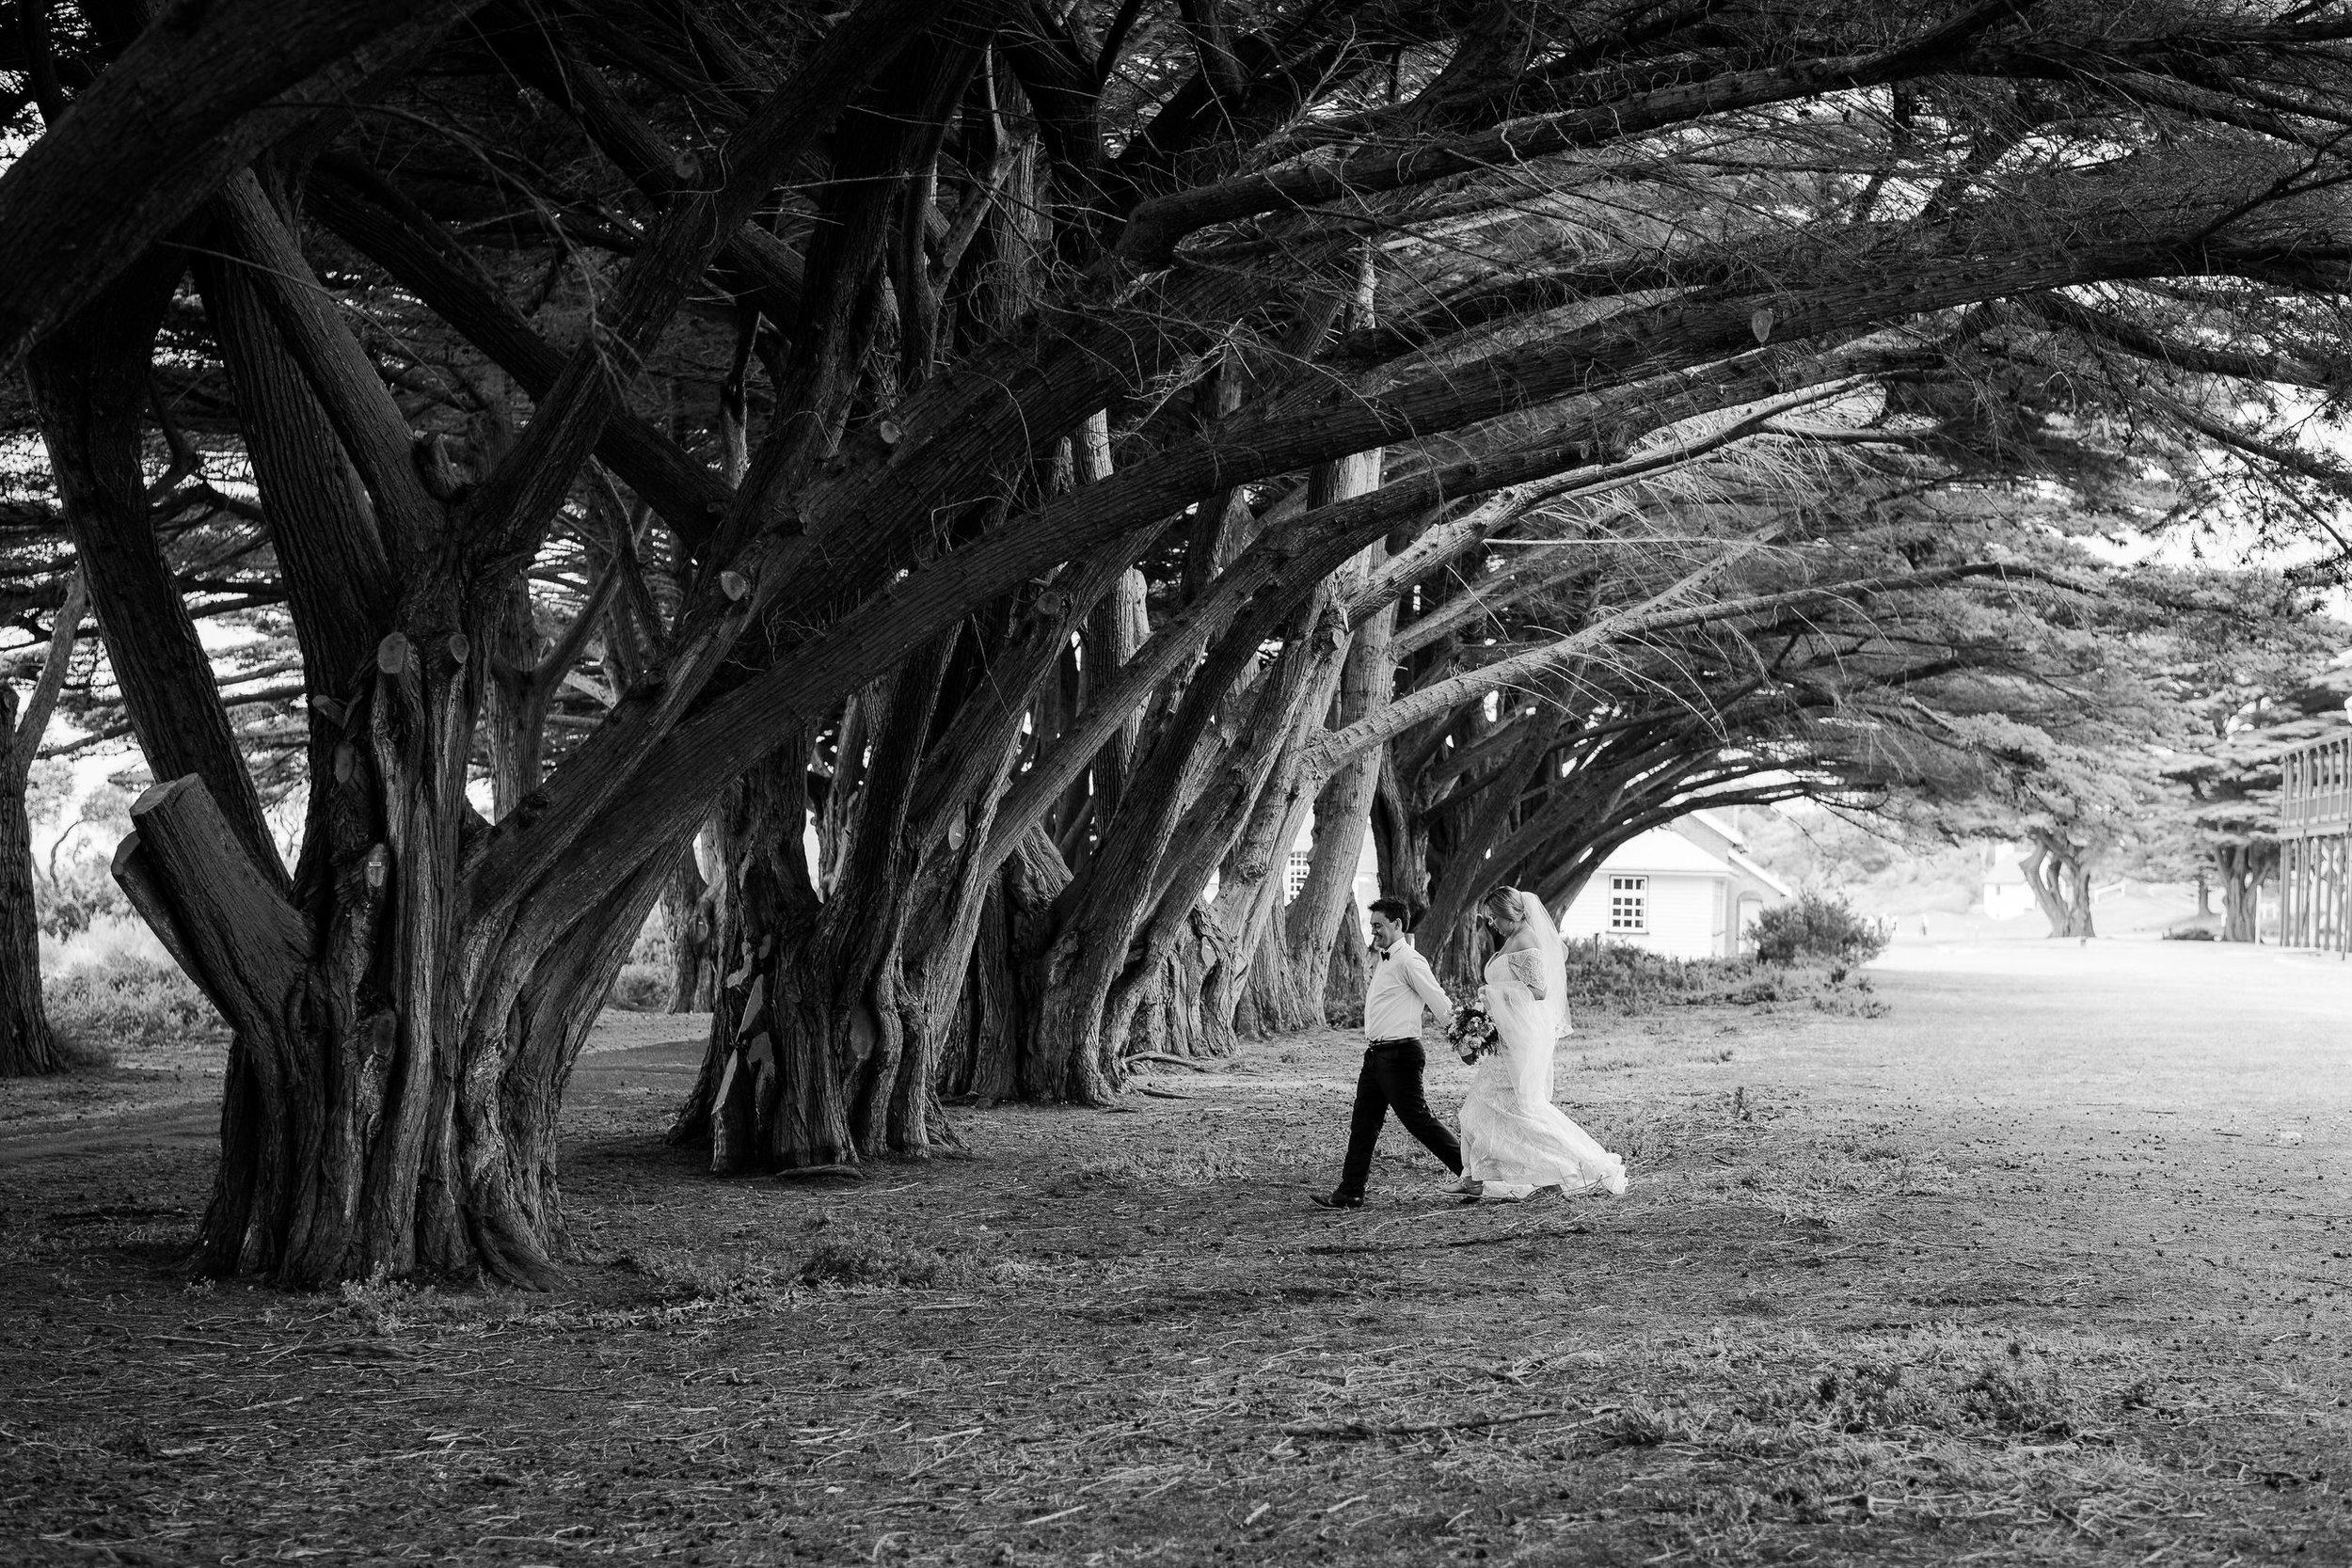 Justin_And_Jim_Photography_Portsea_Pub_Wedding49.JPG